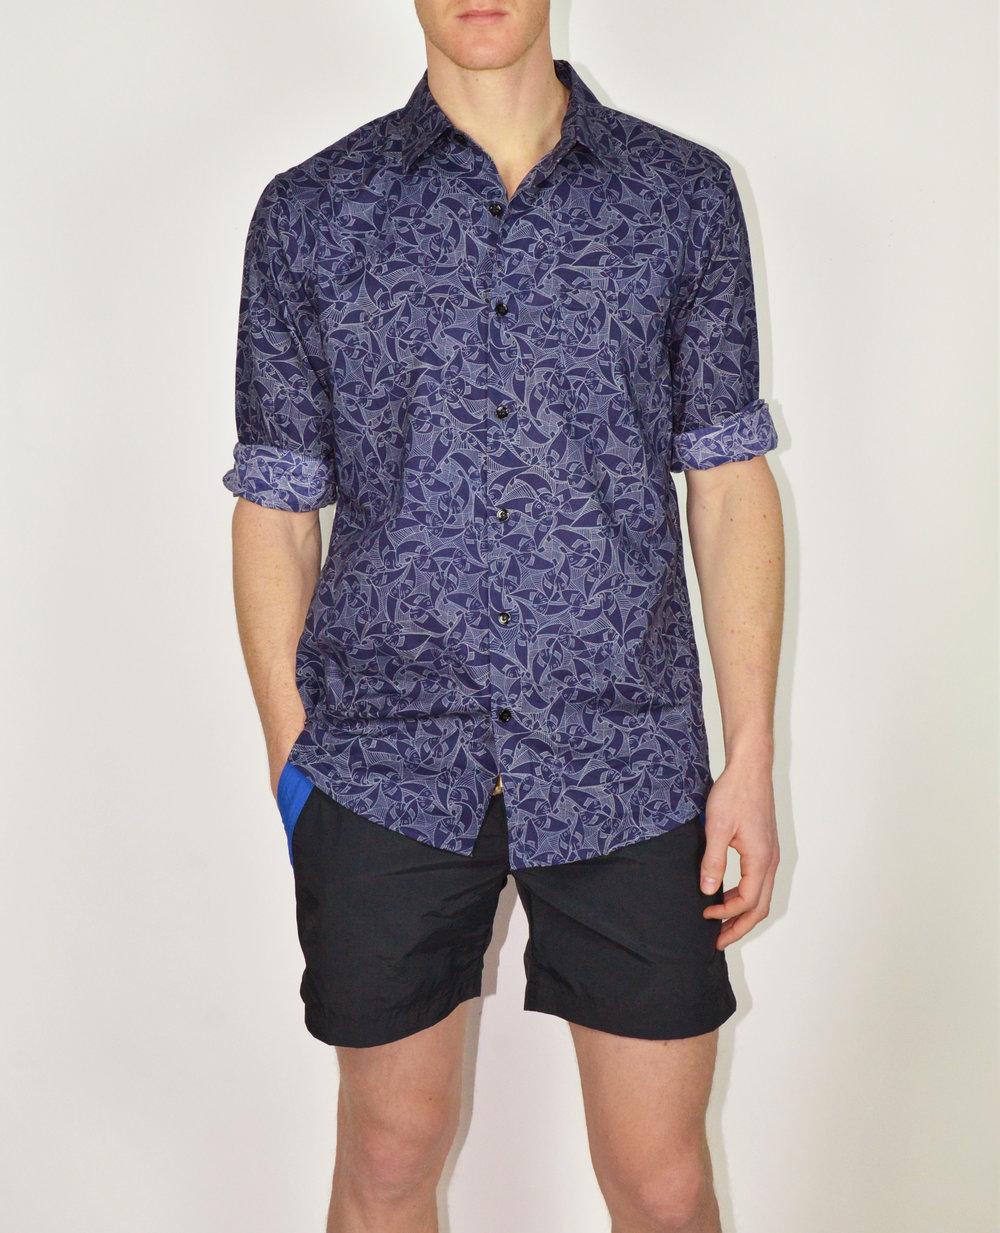 Pescado+Navy+Shirt.jpg